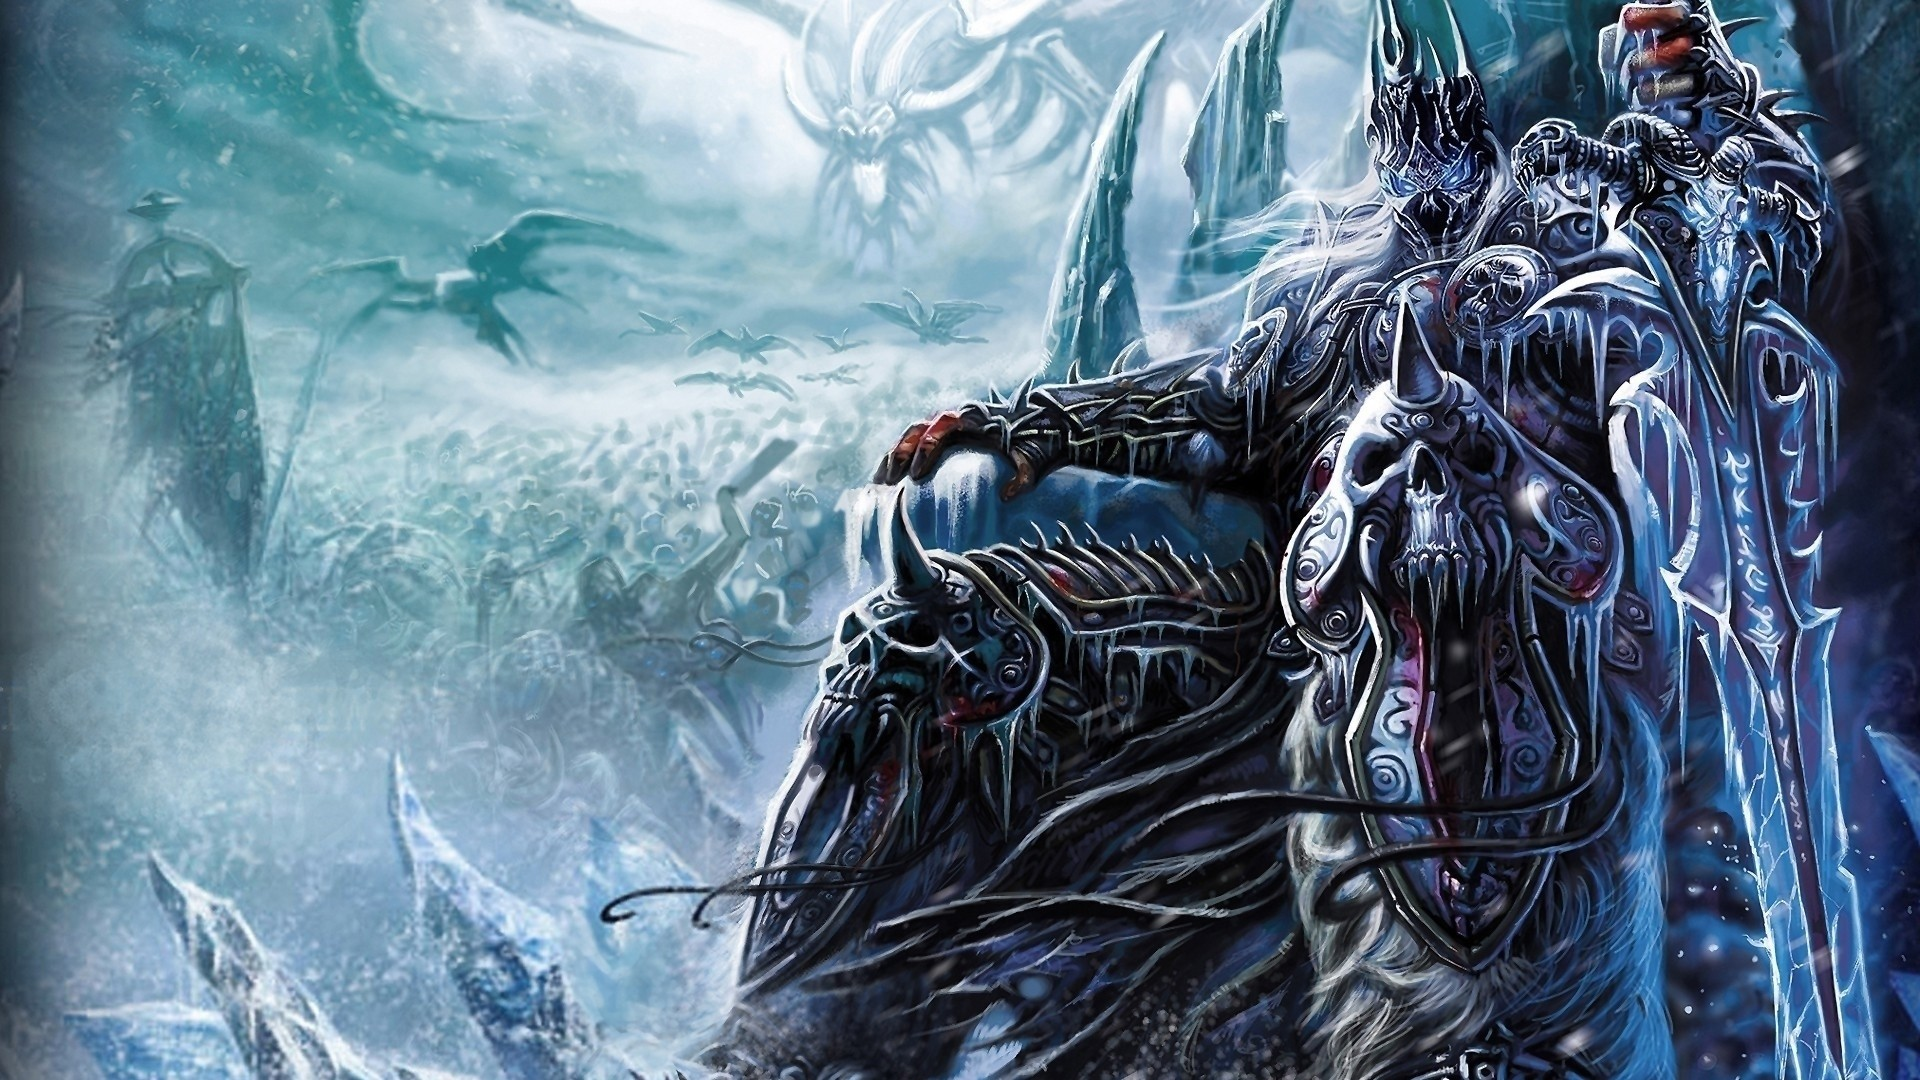 … Background Full HD 1080p. Wallpaper warcraft, lich king,  sword, throne, skulls